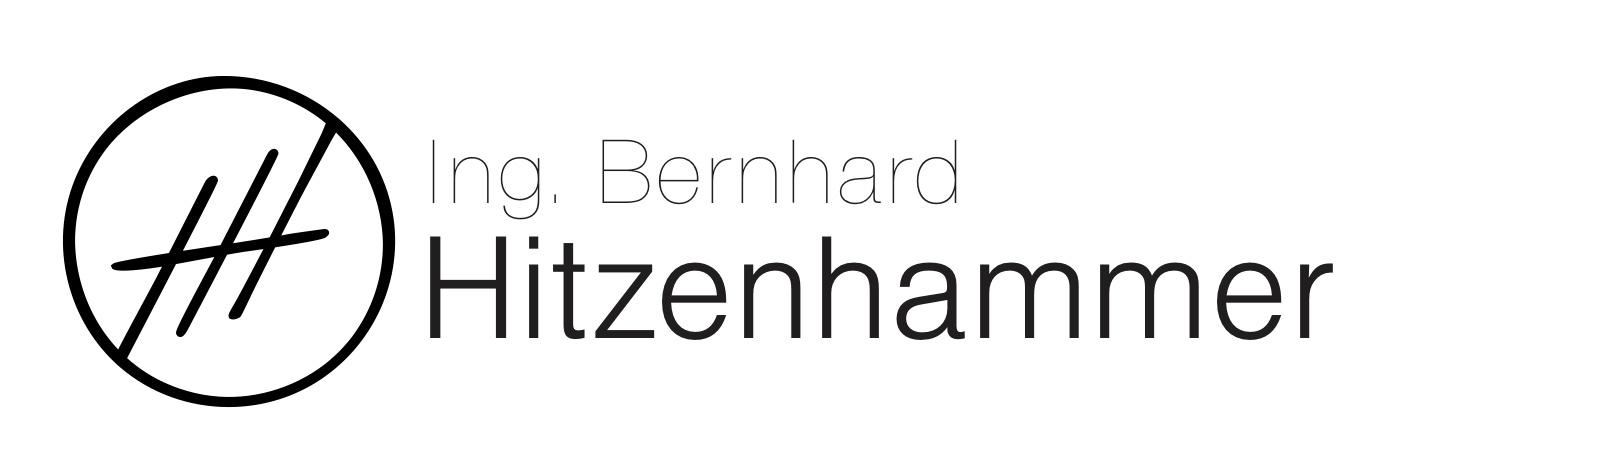 Ing. Bernhard Hitzenhammer